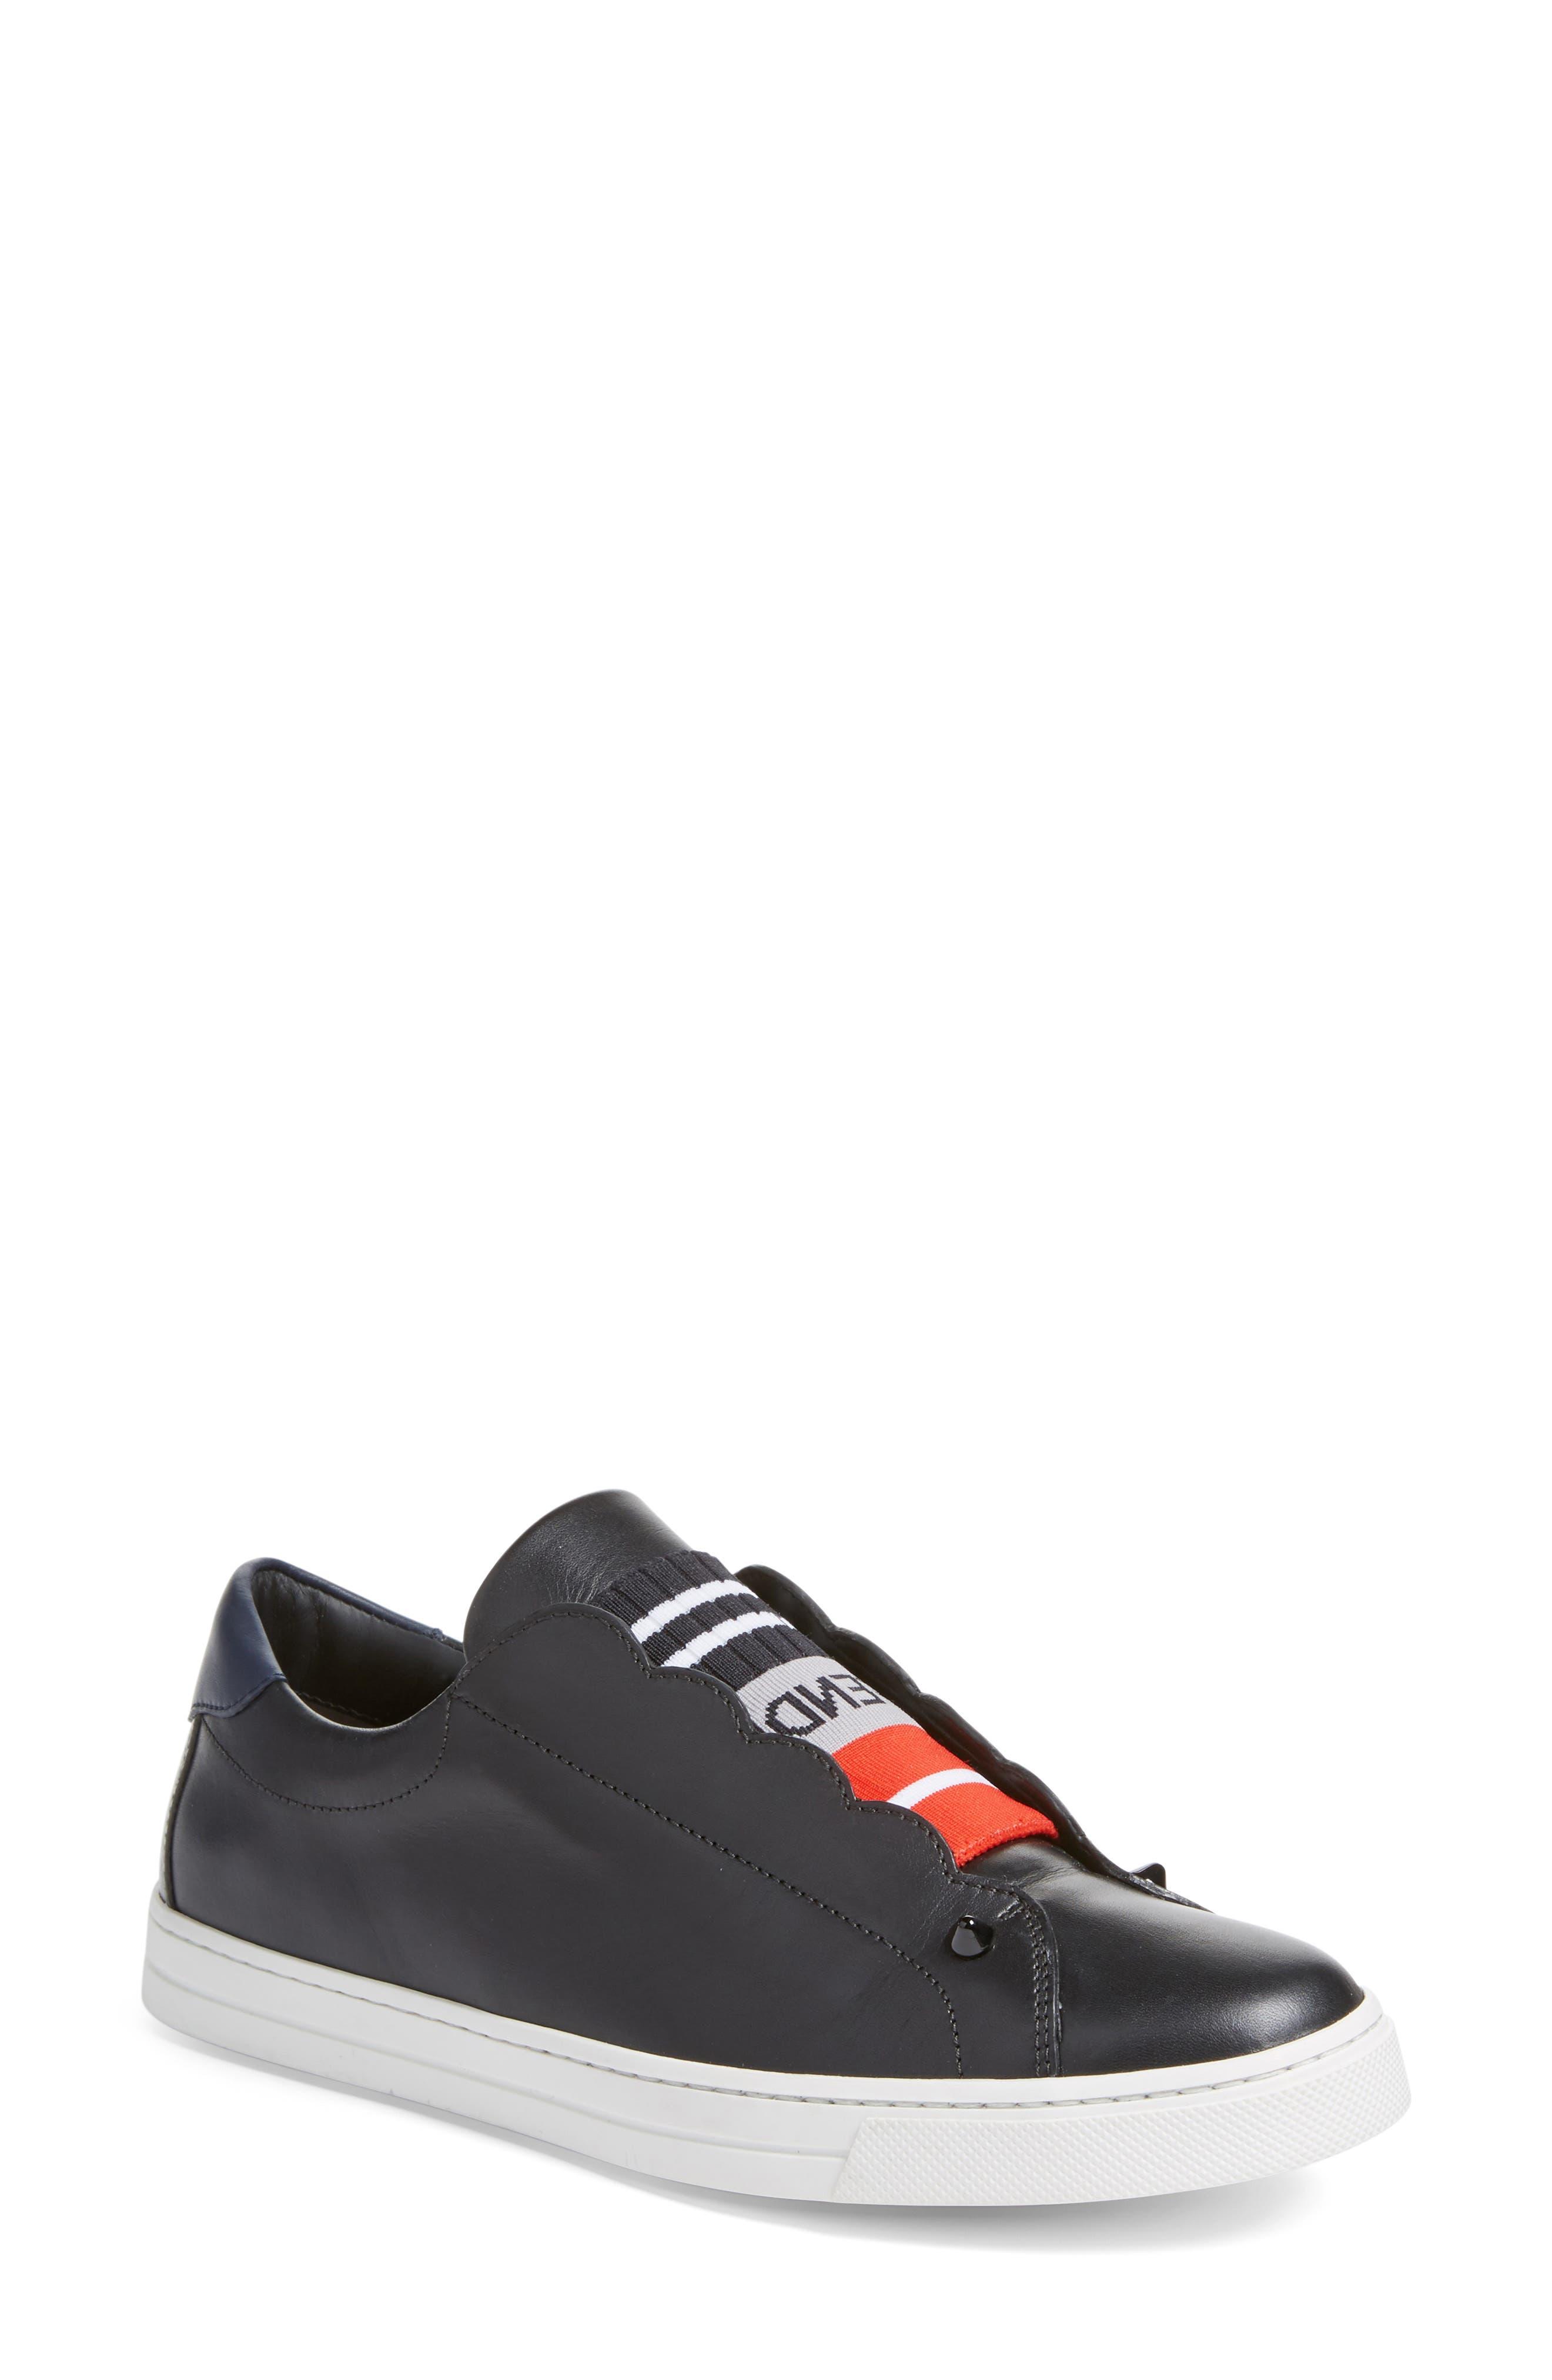 Rockoclick Slip-On Sneaker,                         Main,                         color, 001